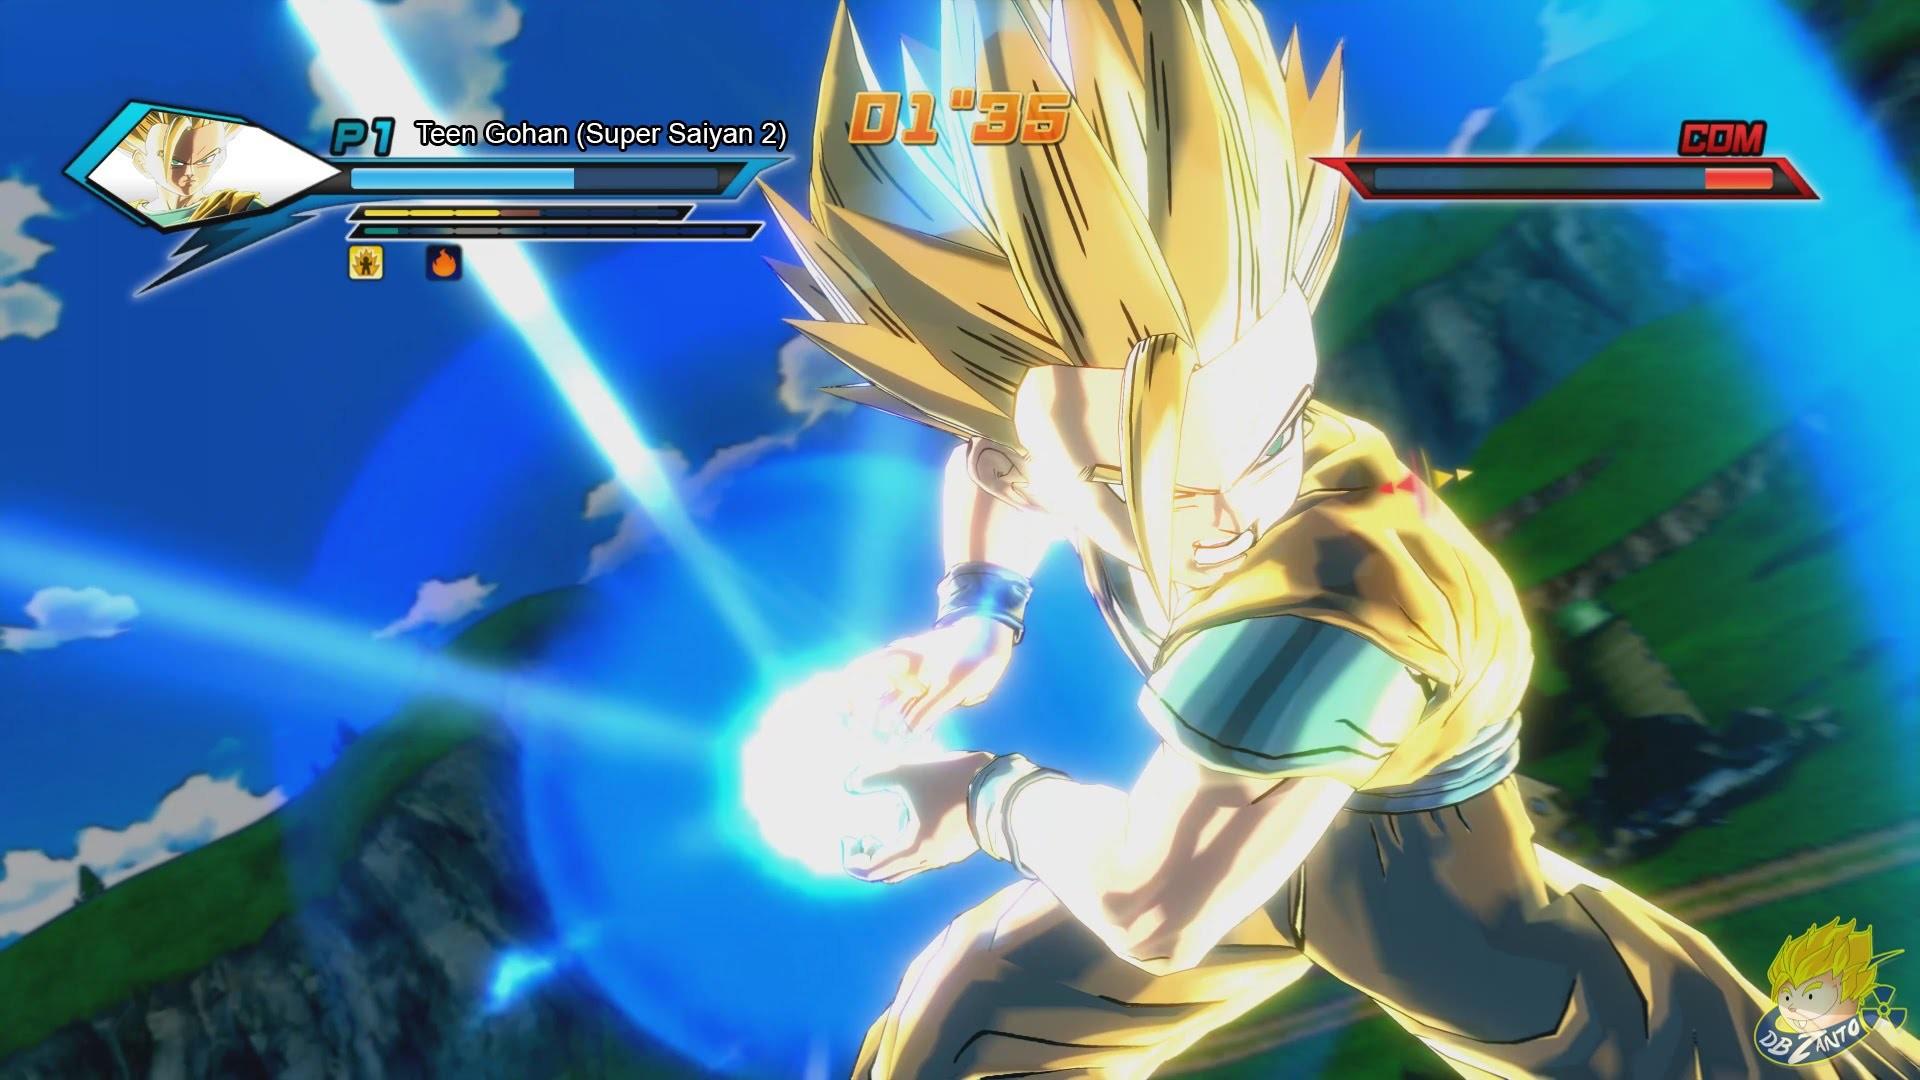 Dragon Ball Xenoverse (PC): SSJ2 Teen Gohan (Bojack Unbound Outfit)  [MOD]【60FPS 1080P】 – YouTube